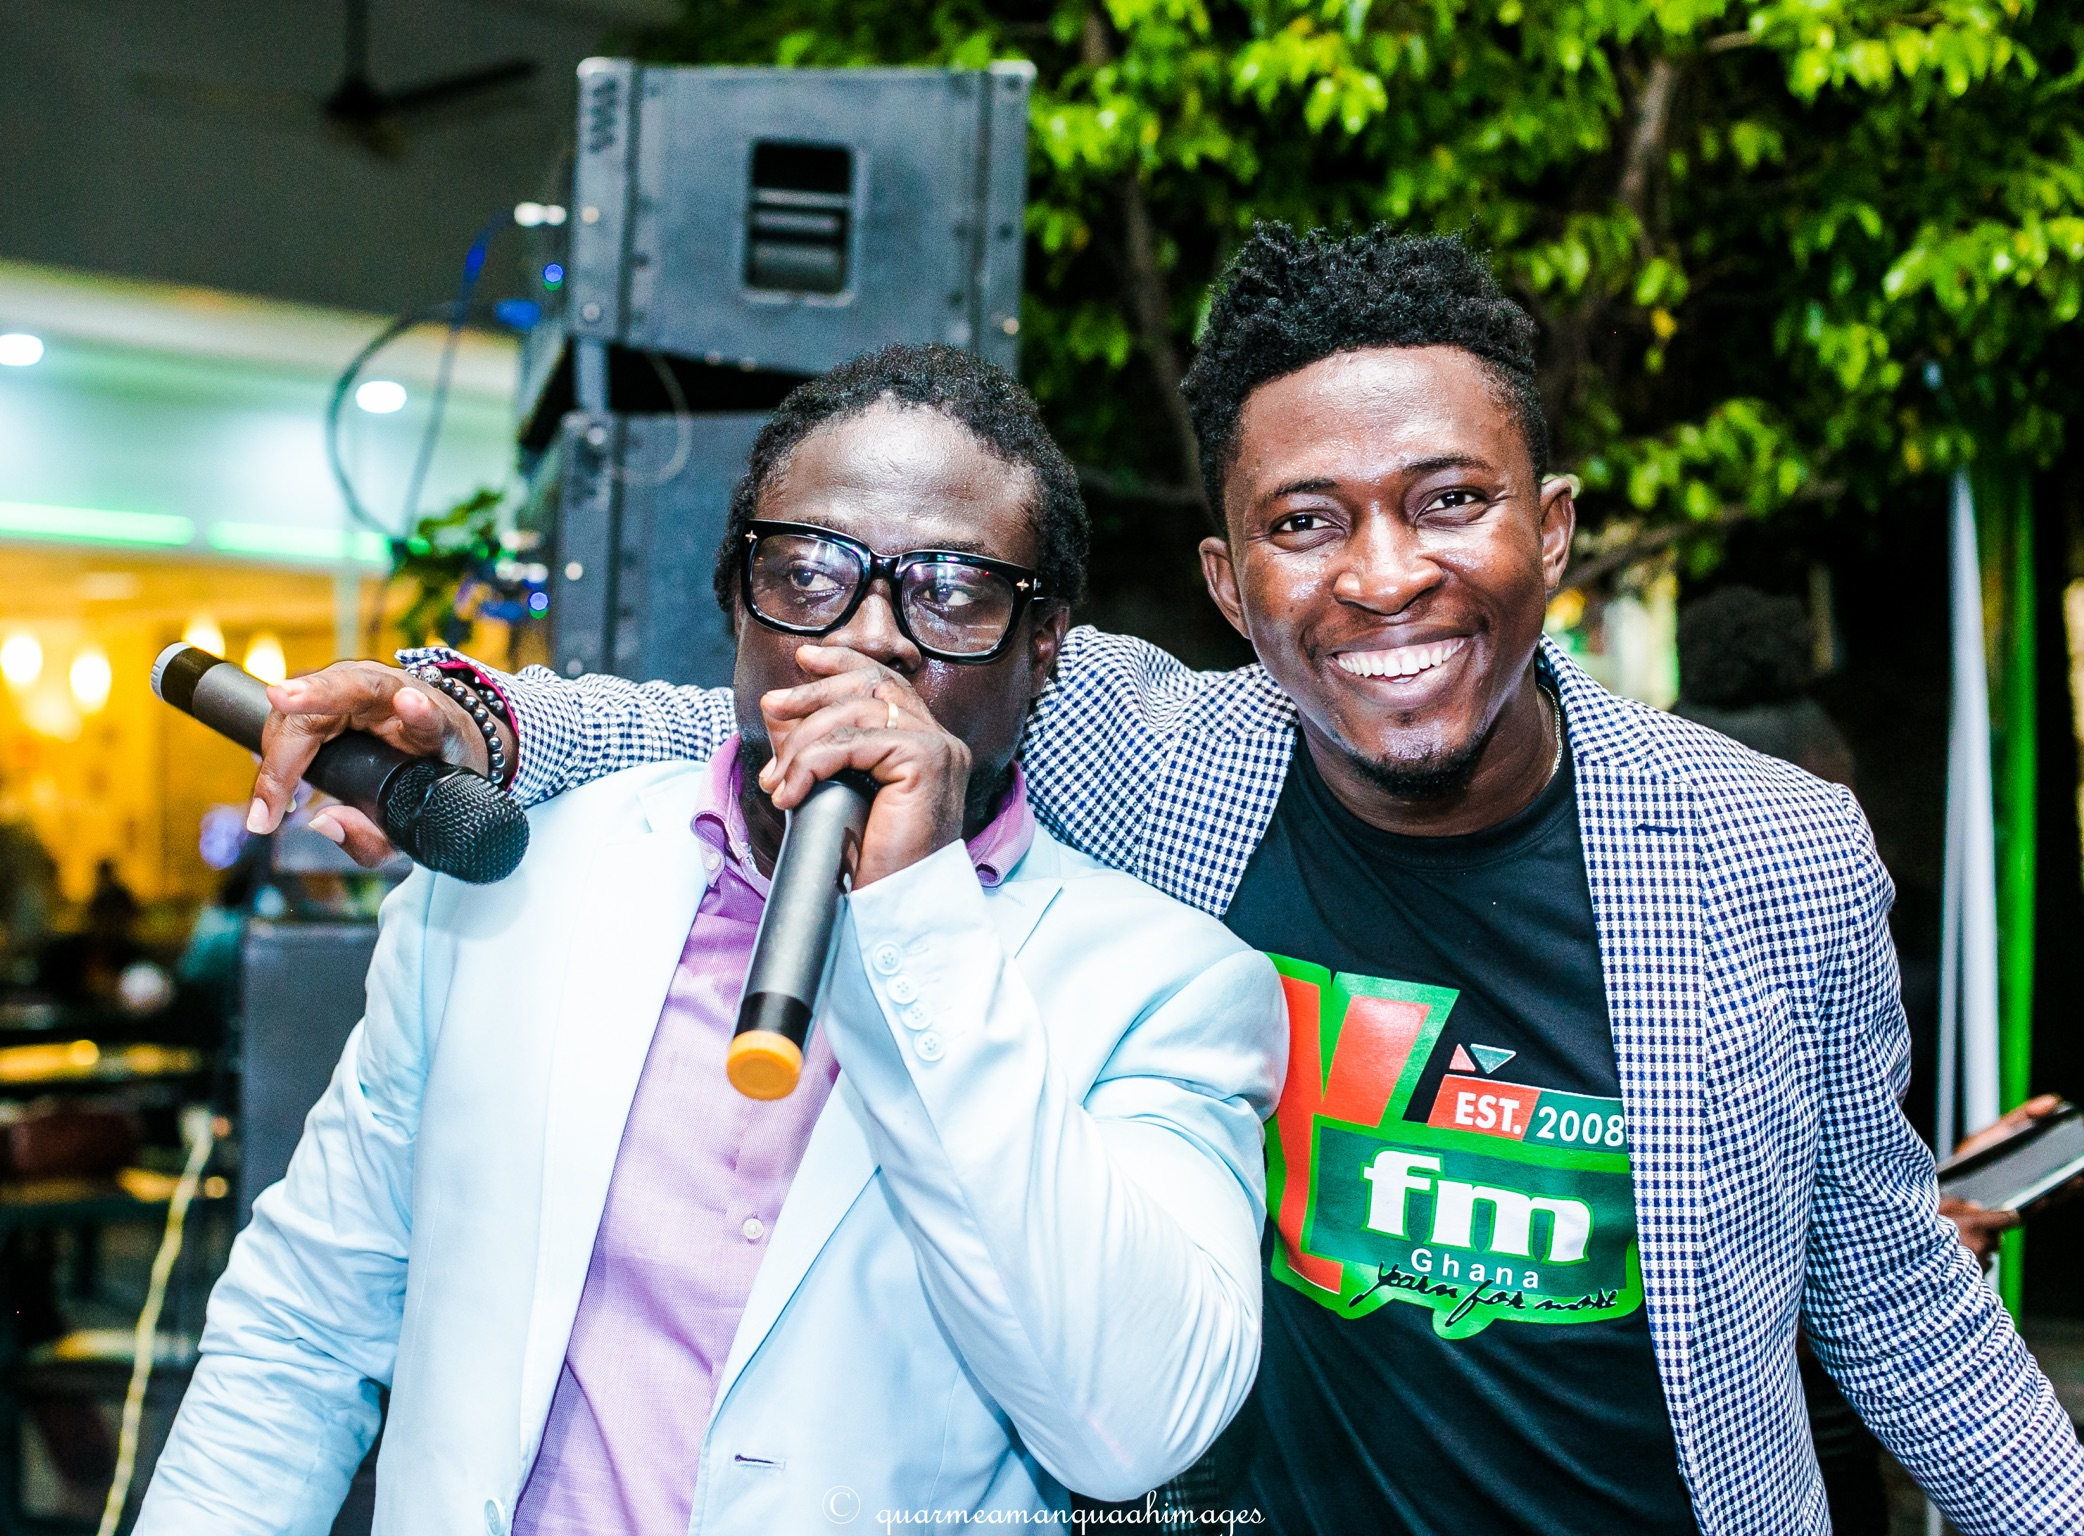 YFM to Crown #Yat10 Anniversary with Massive Area Codes Jam